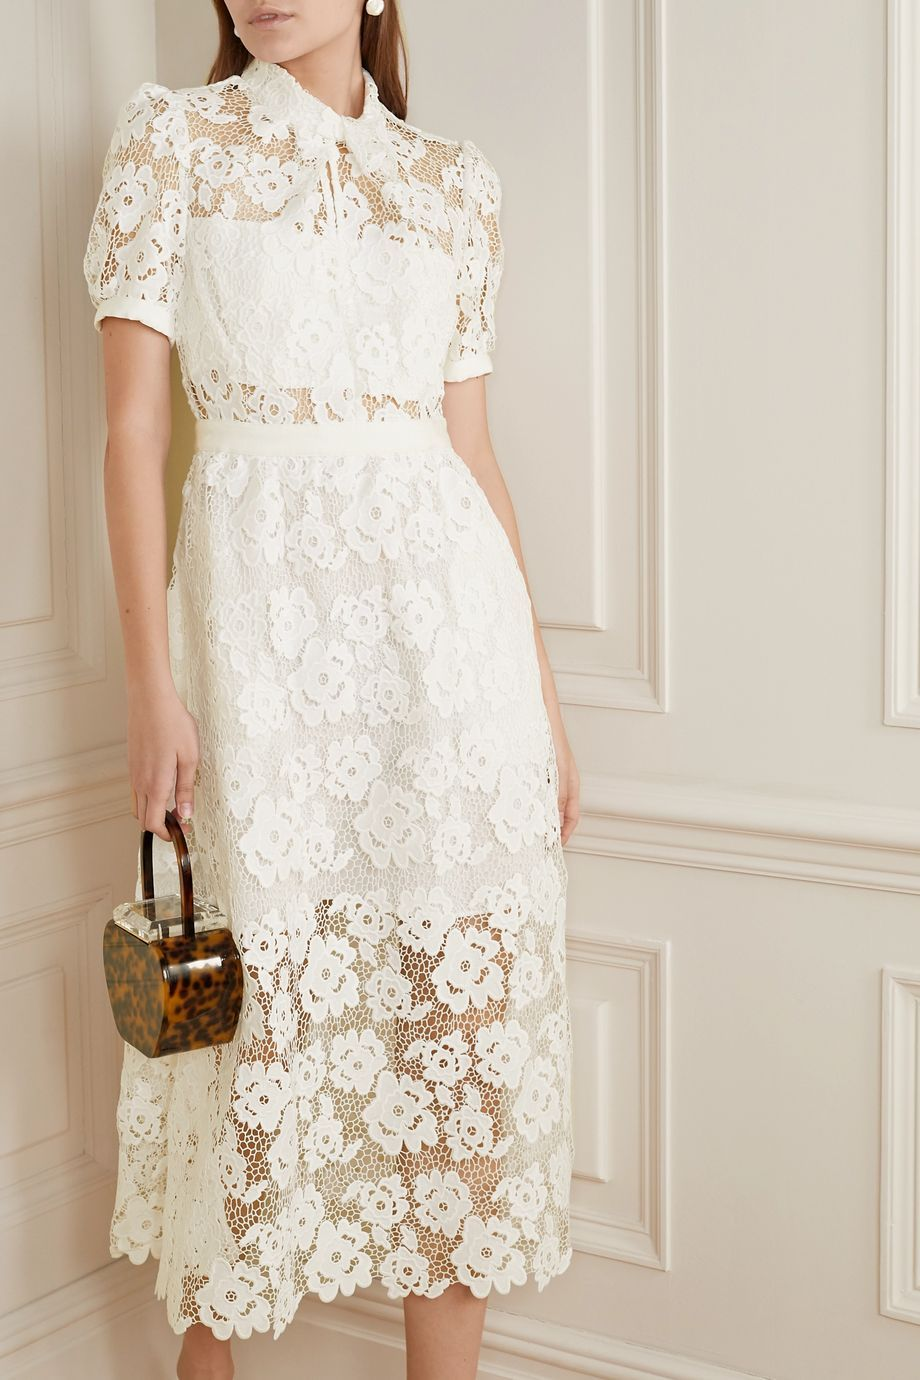 White Grosgrain Trimmed Guipure Lace Midi Dress Self Portrait Lace Midi Dress Lace White Dress Midi Dress [ 1380 x 920 Pixel ]